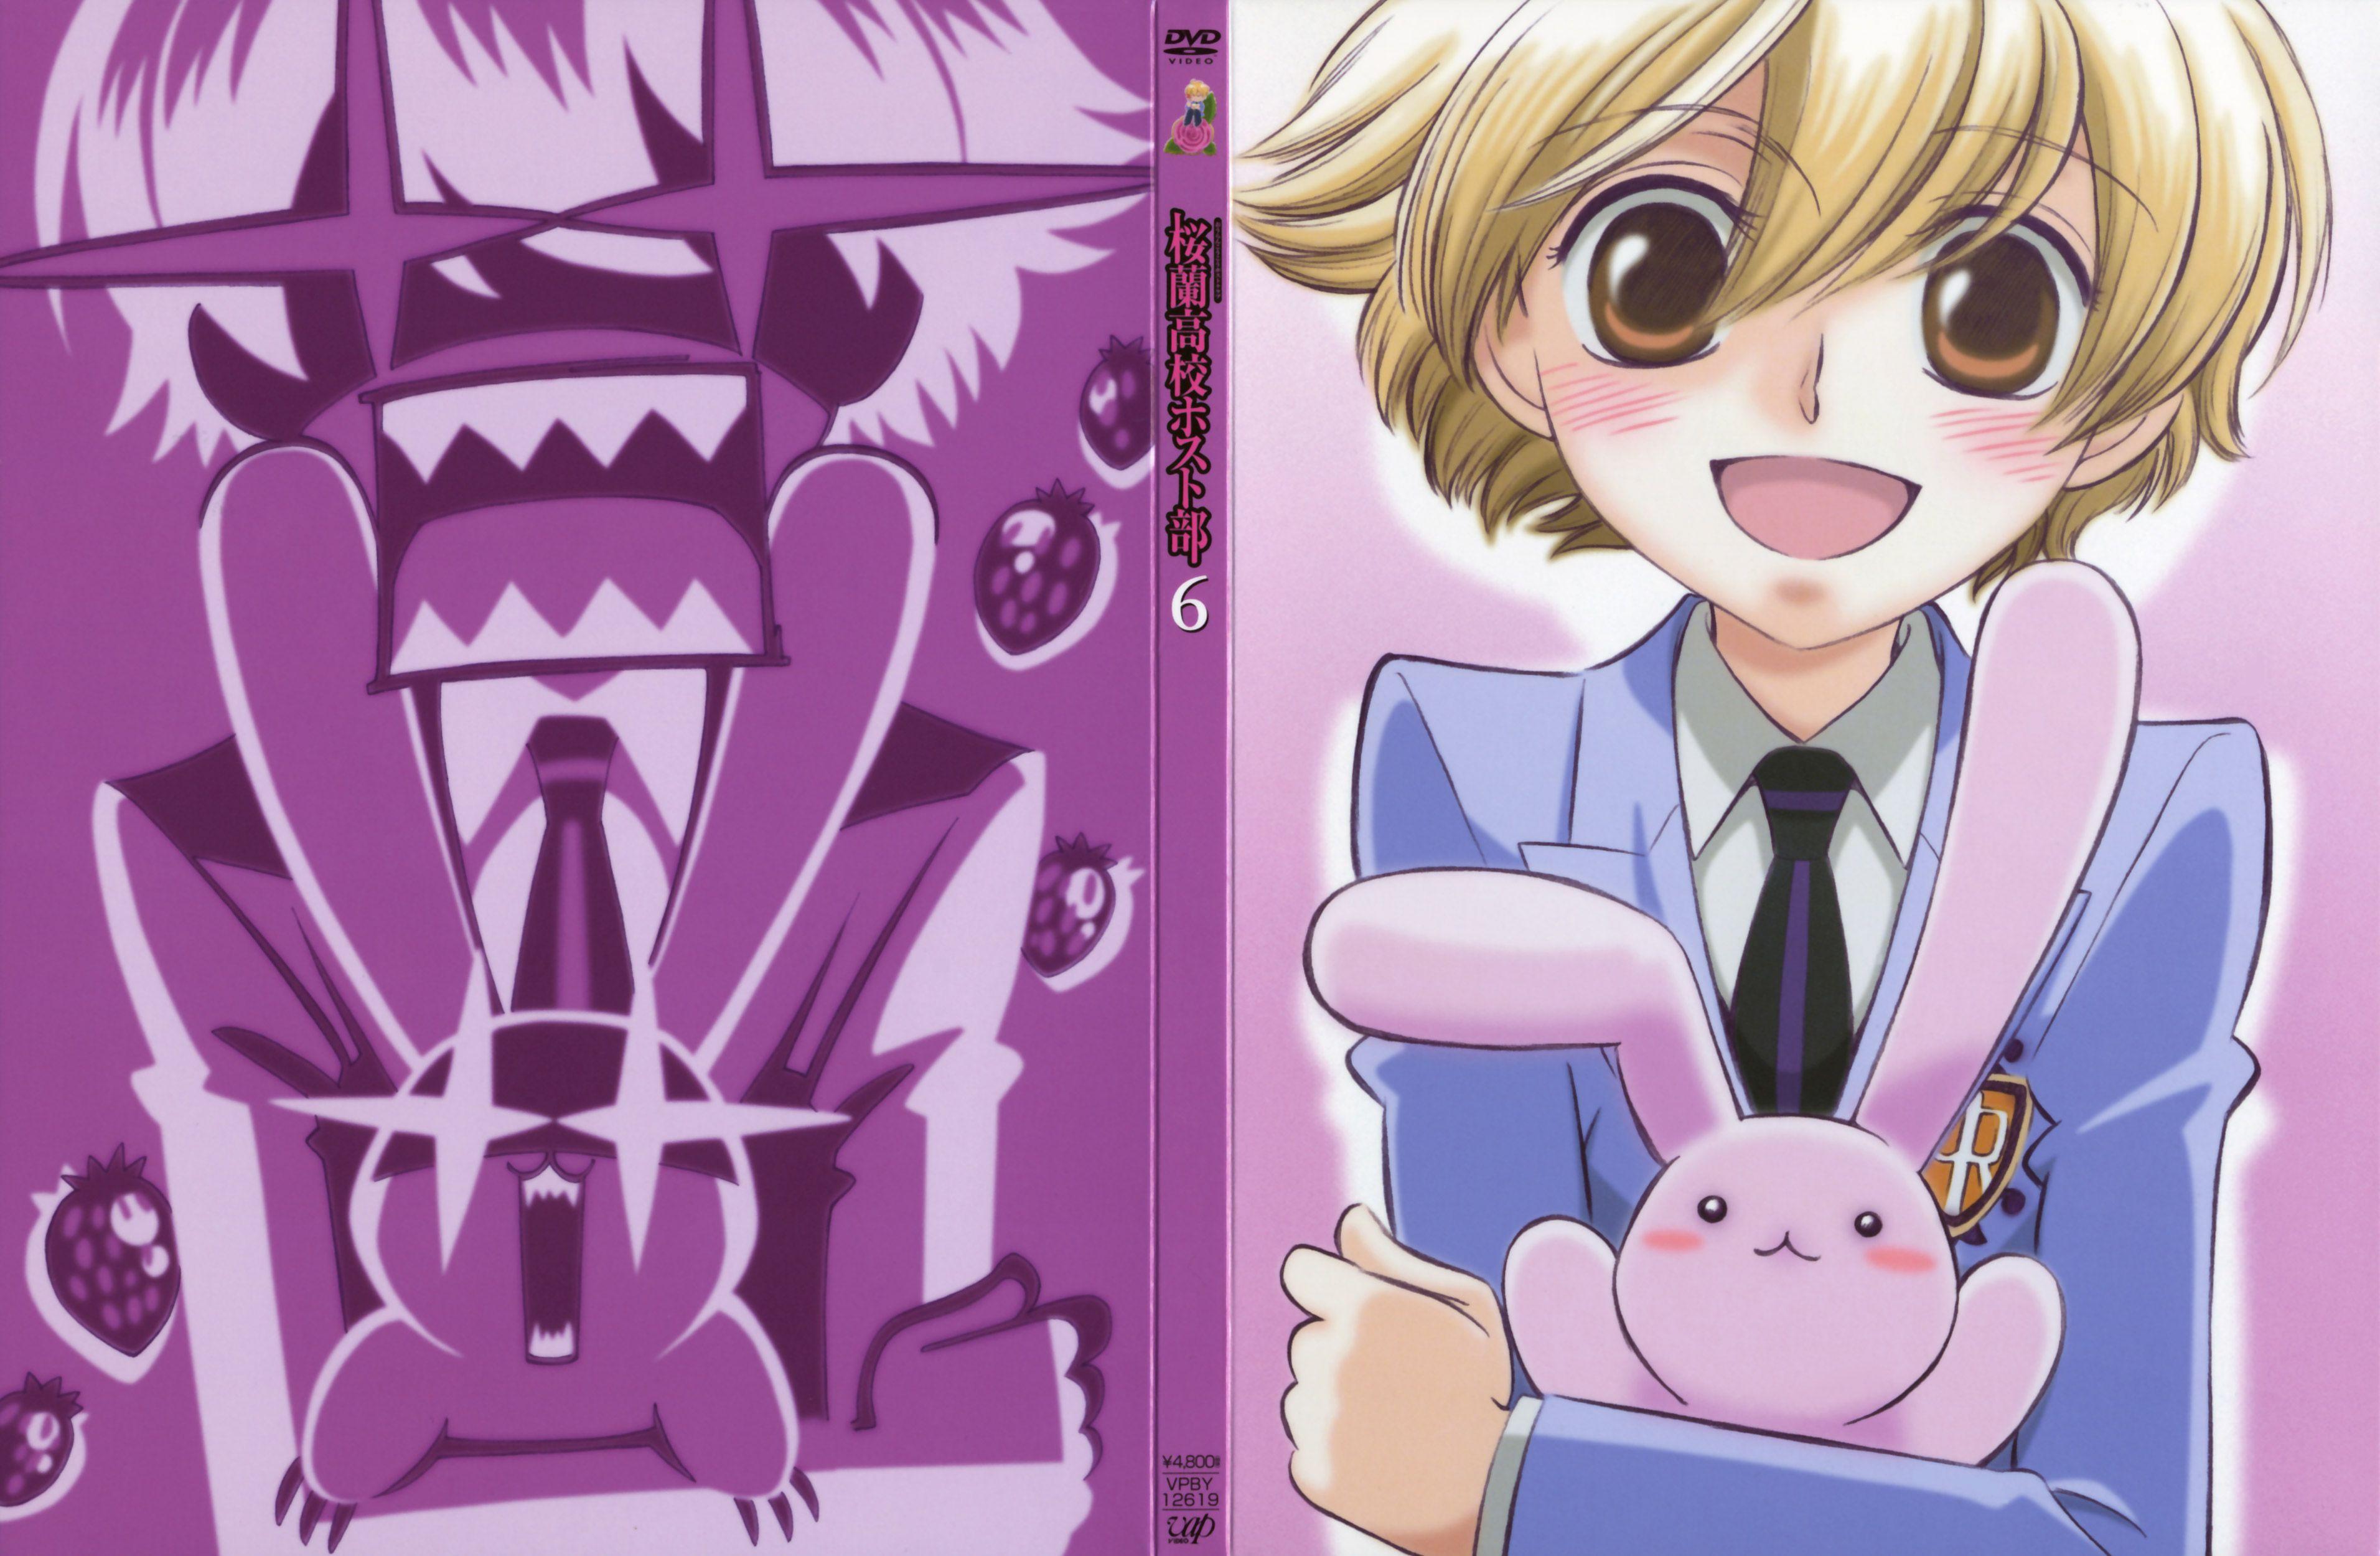 Tags Ouran High School Host Club Haninozuka Mitsukuni Dvd